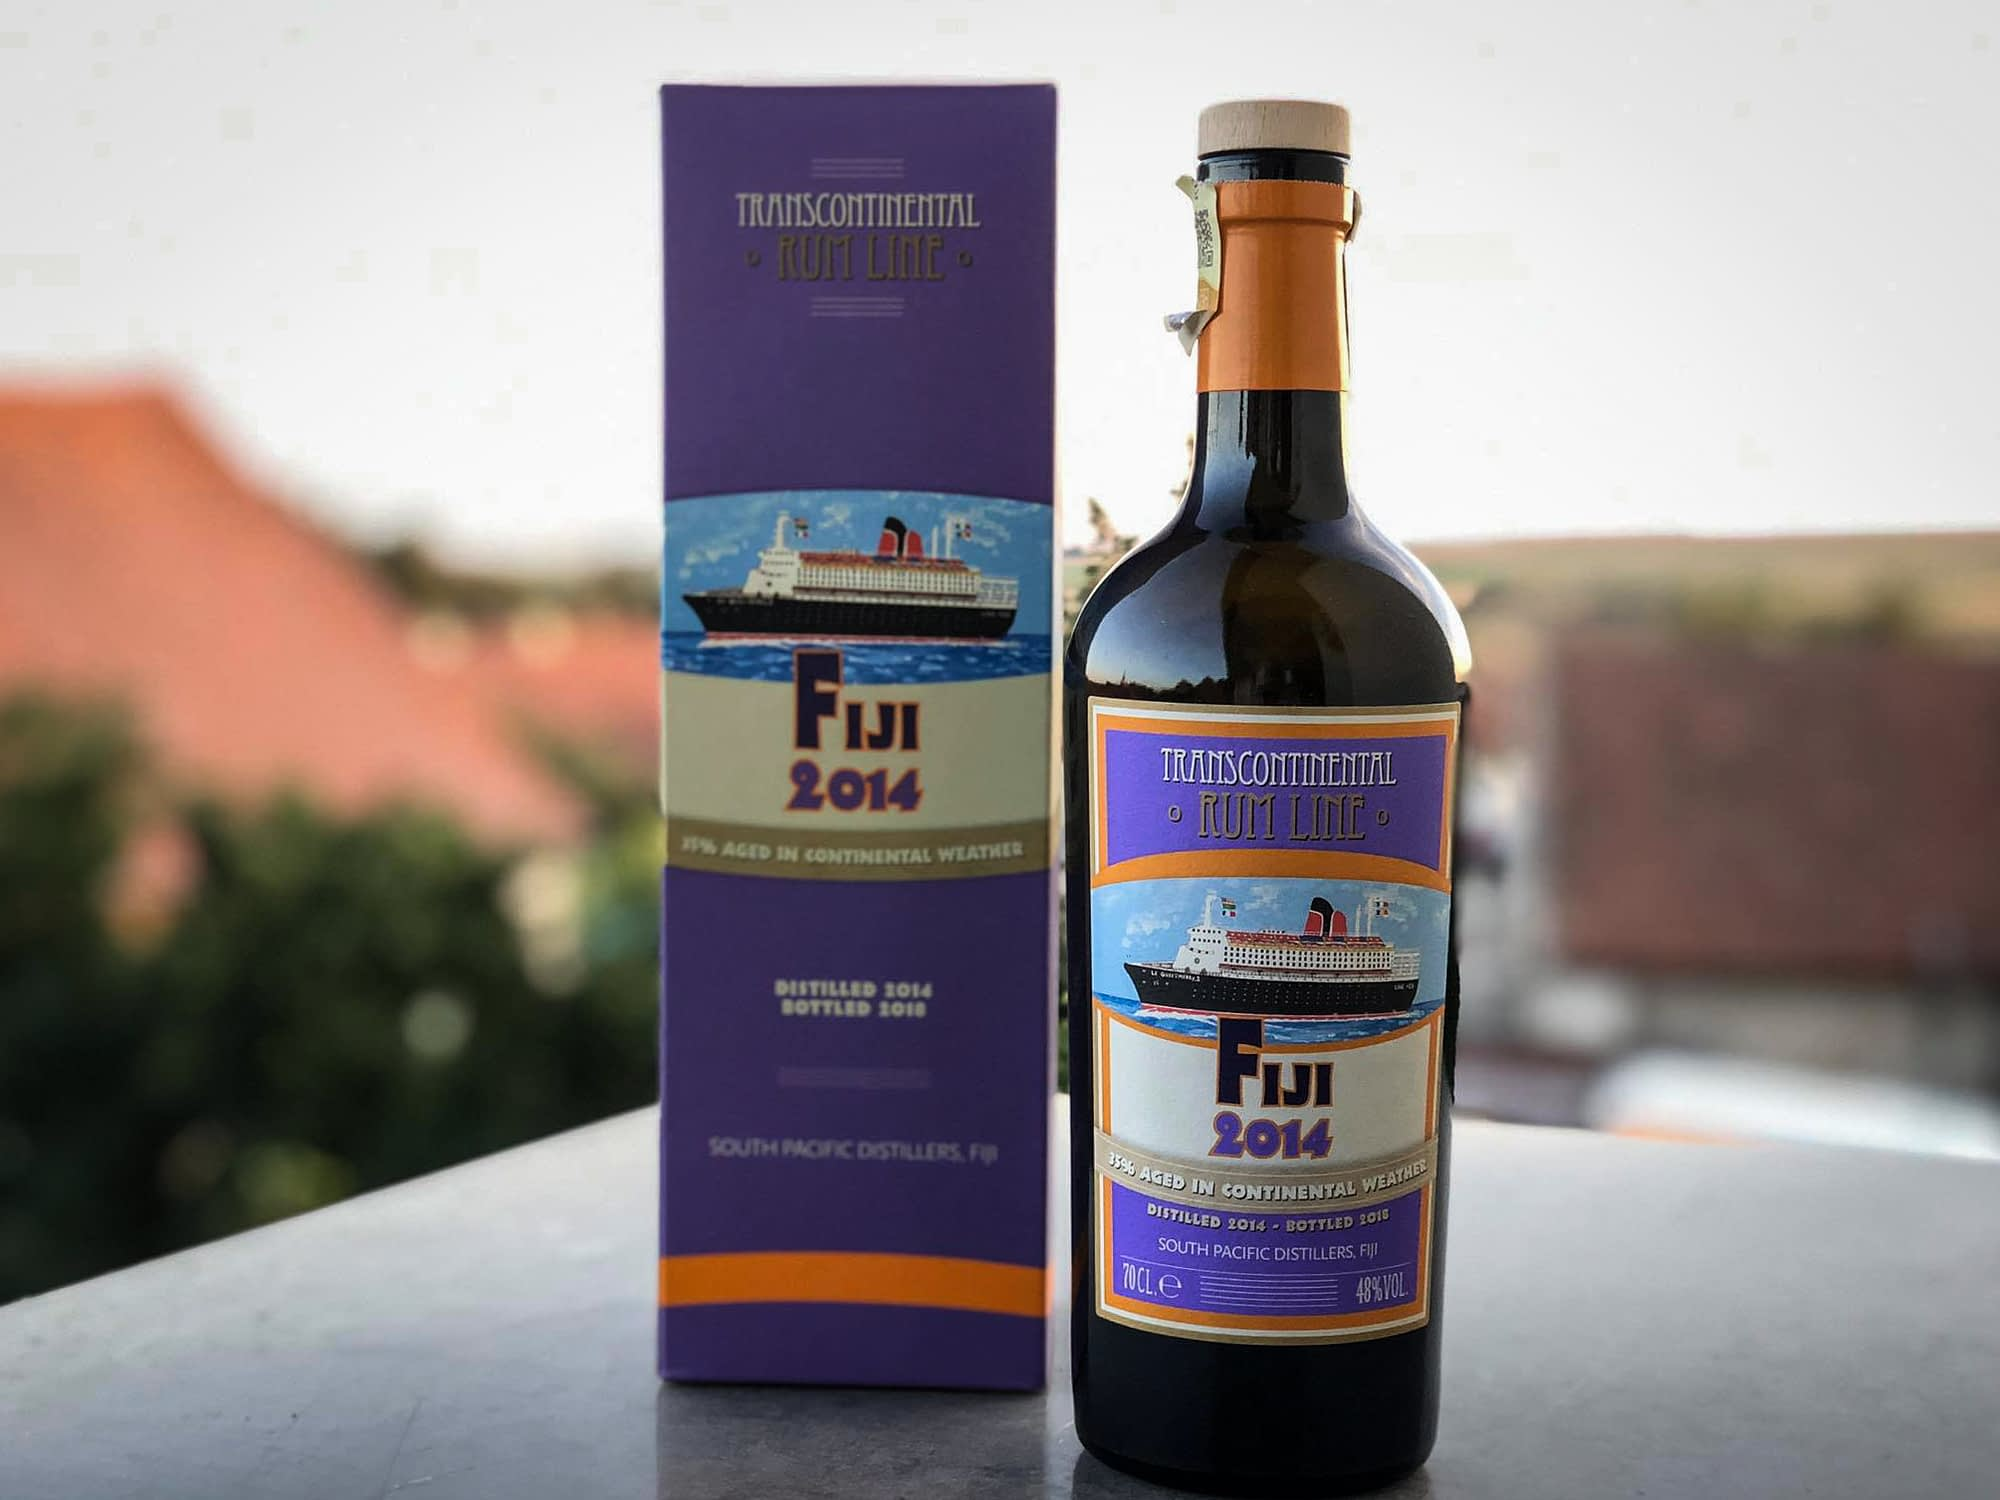 Transcontinental Rum Line Fiji 2014 – Na vlnách (ovocného) podivna